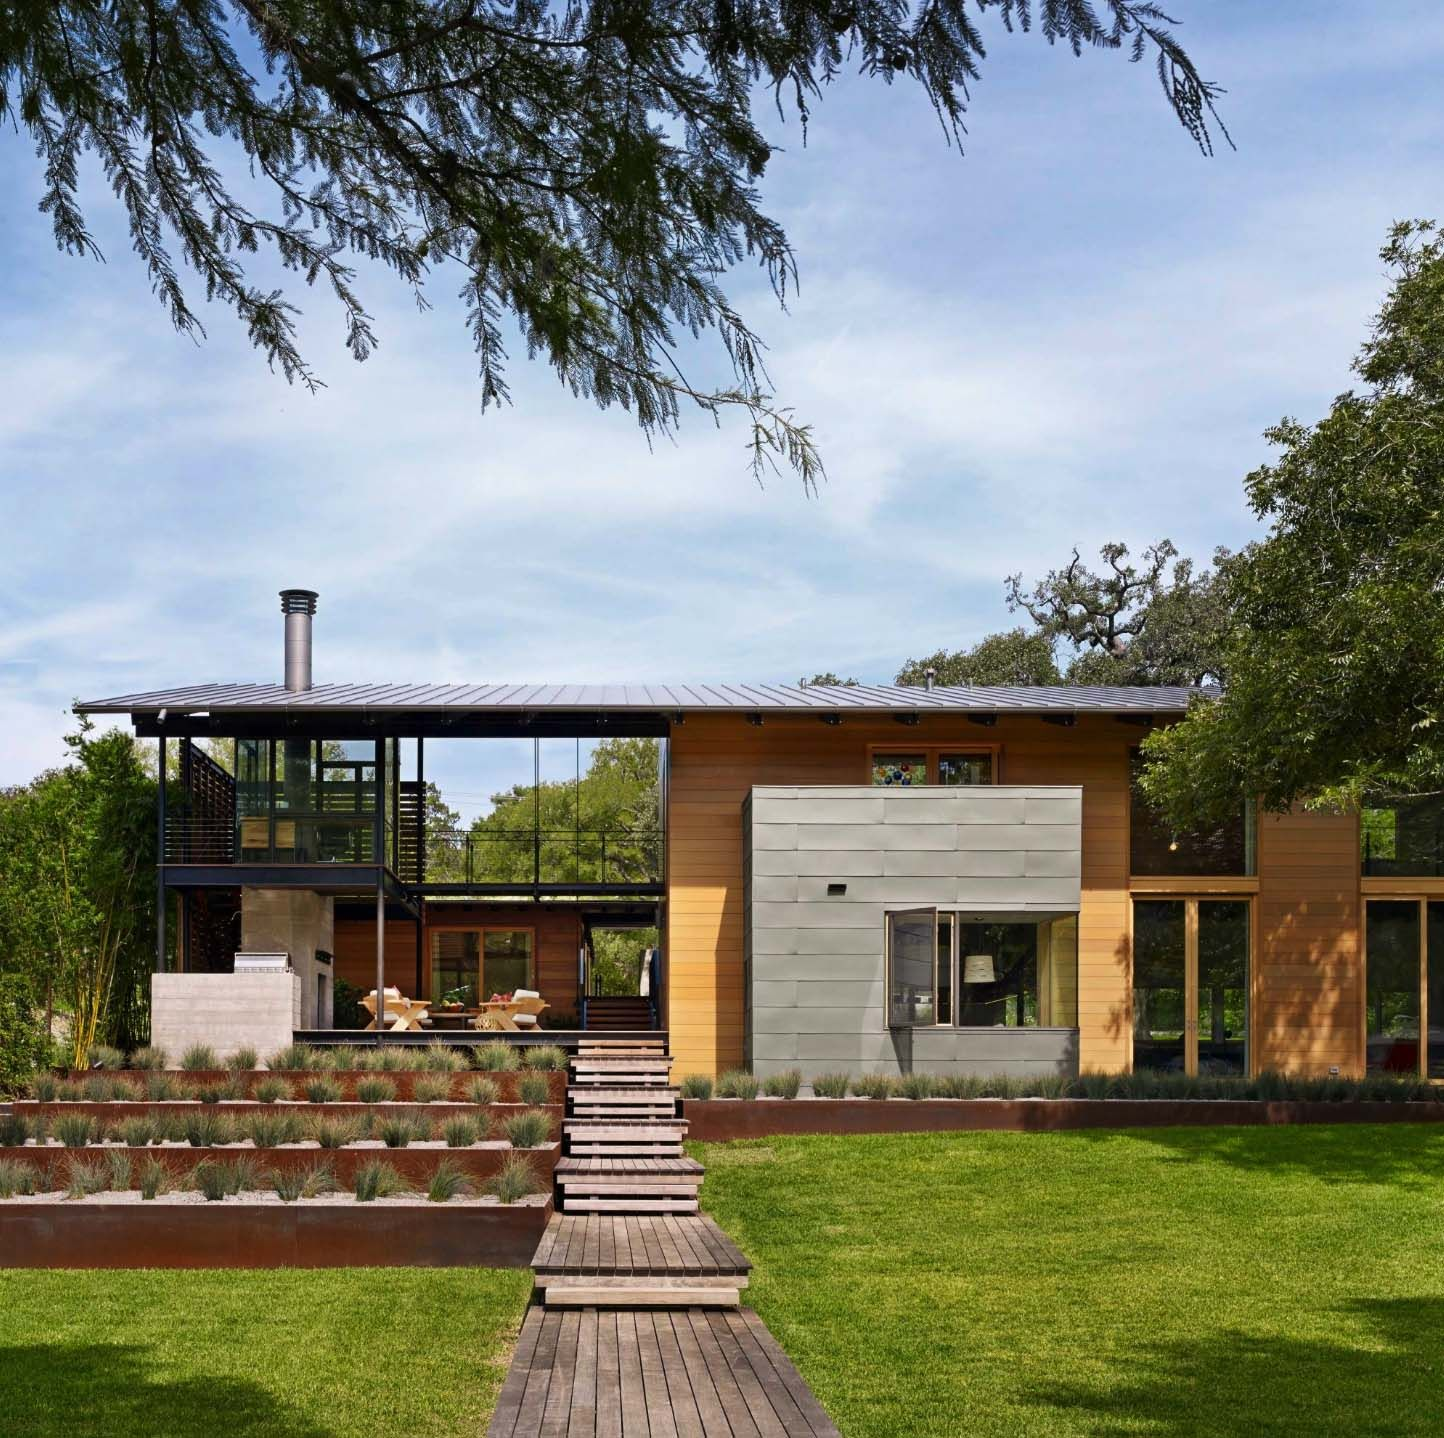 Modern Homes Austin: Fabulous Modern Lakeside Retreat Set On The Shores Of Lake